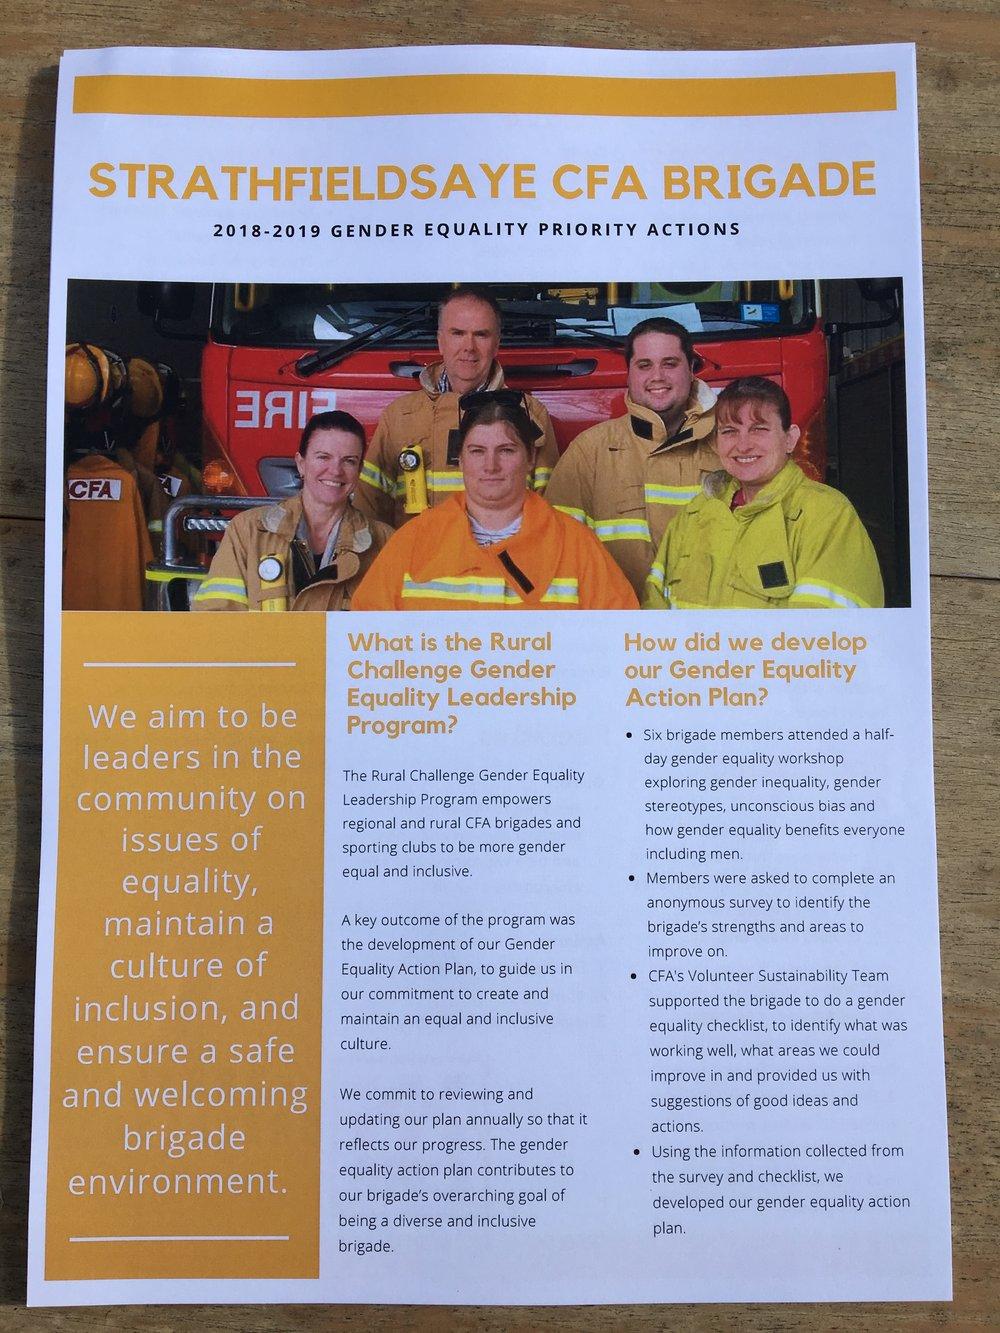 Strathfieldsaye CFA Brigade's Gender Equality Action Plan Goal